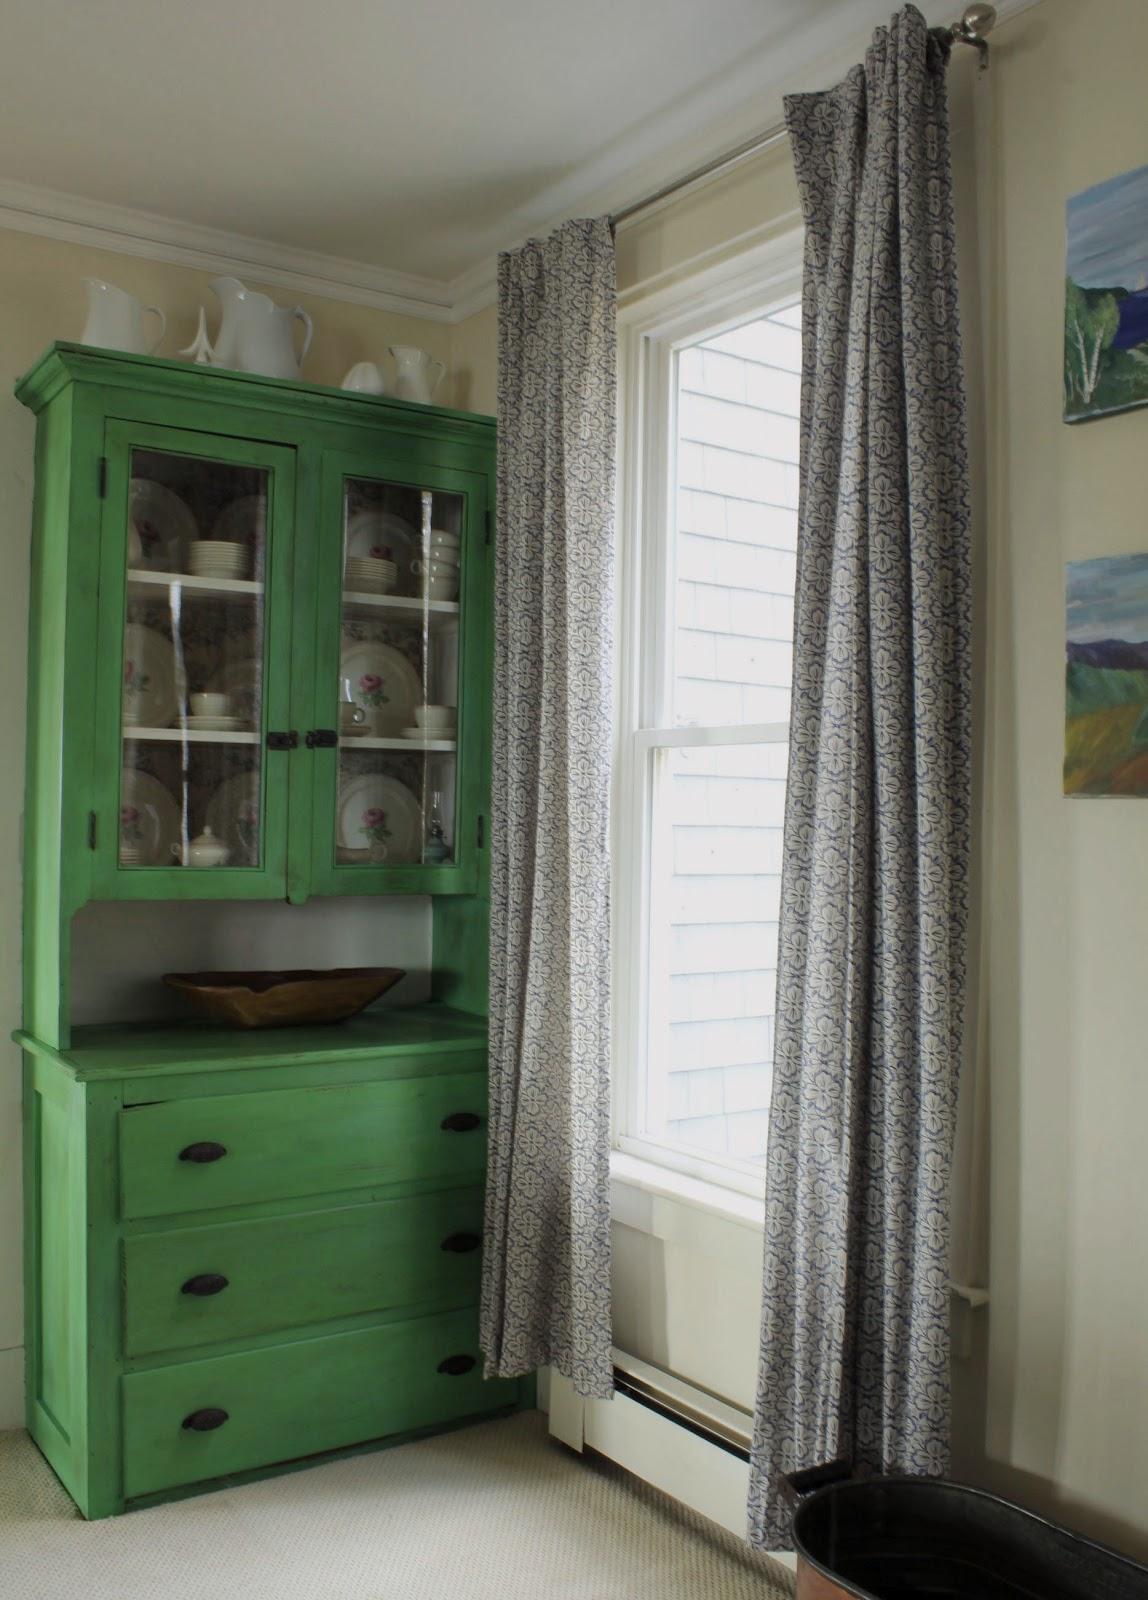 Ascp Antibes Green Cupboard